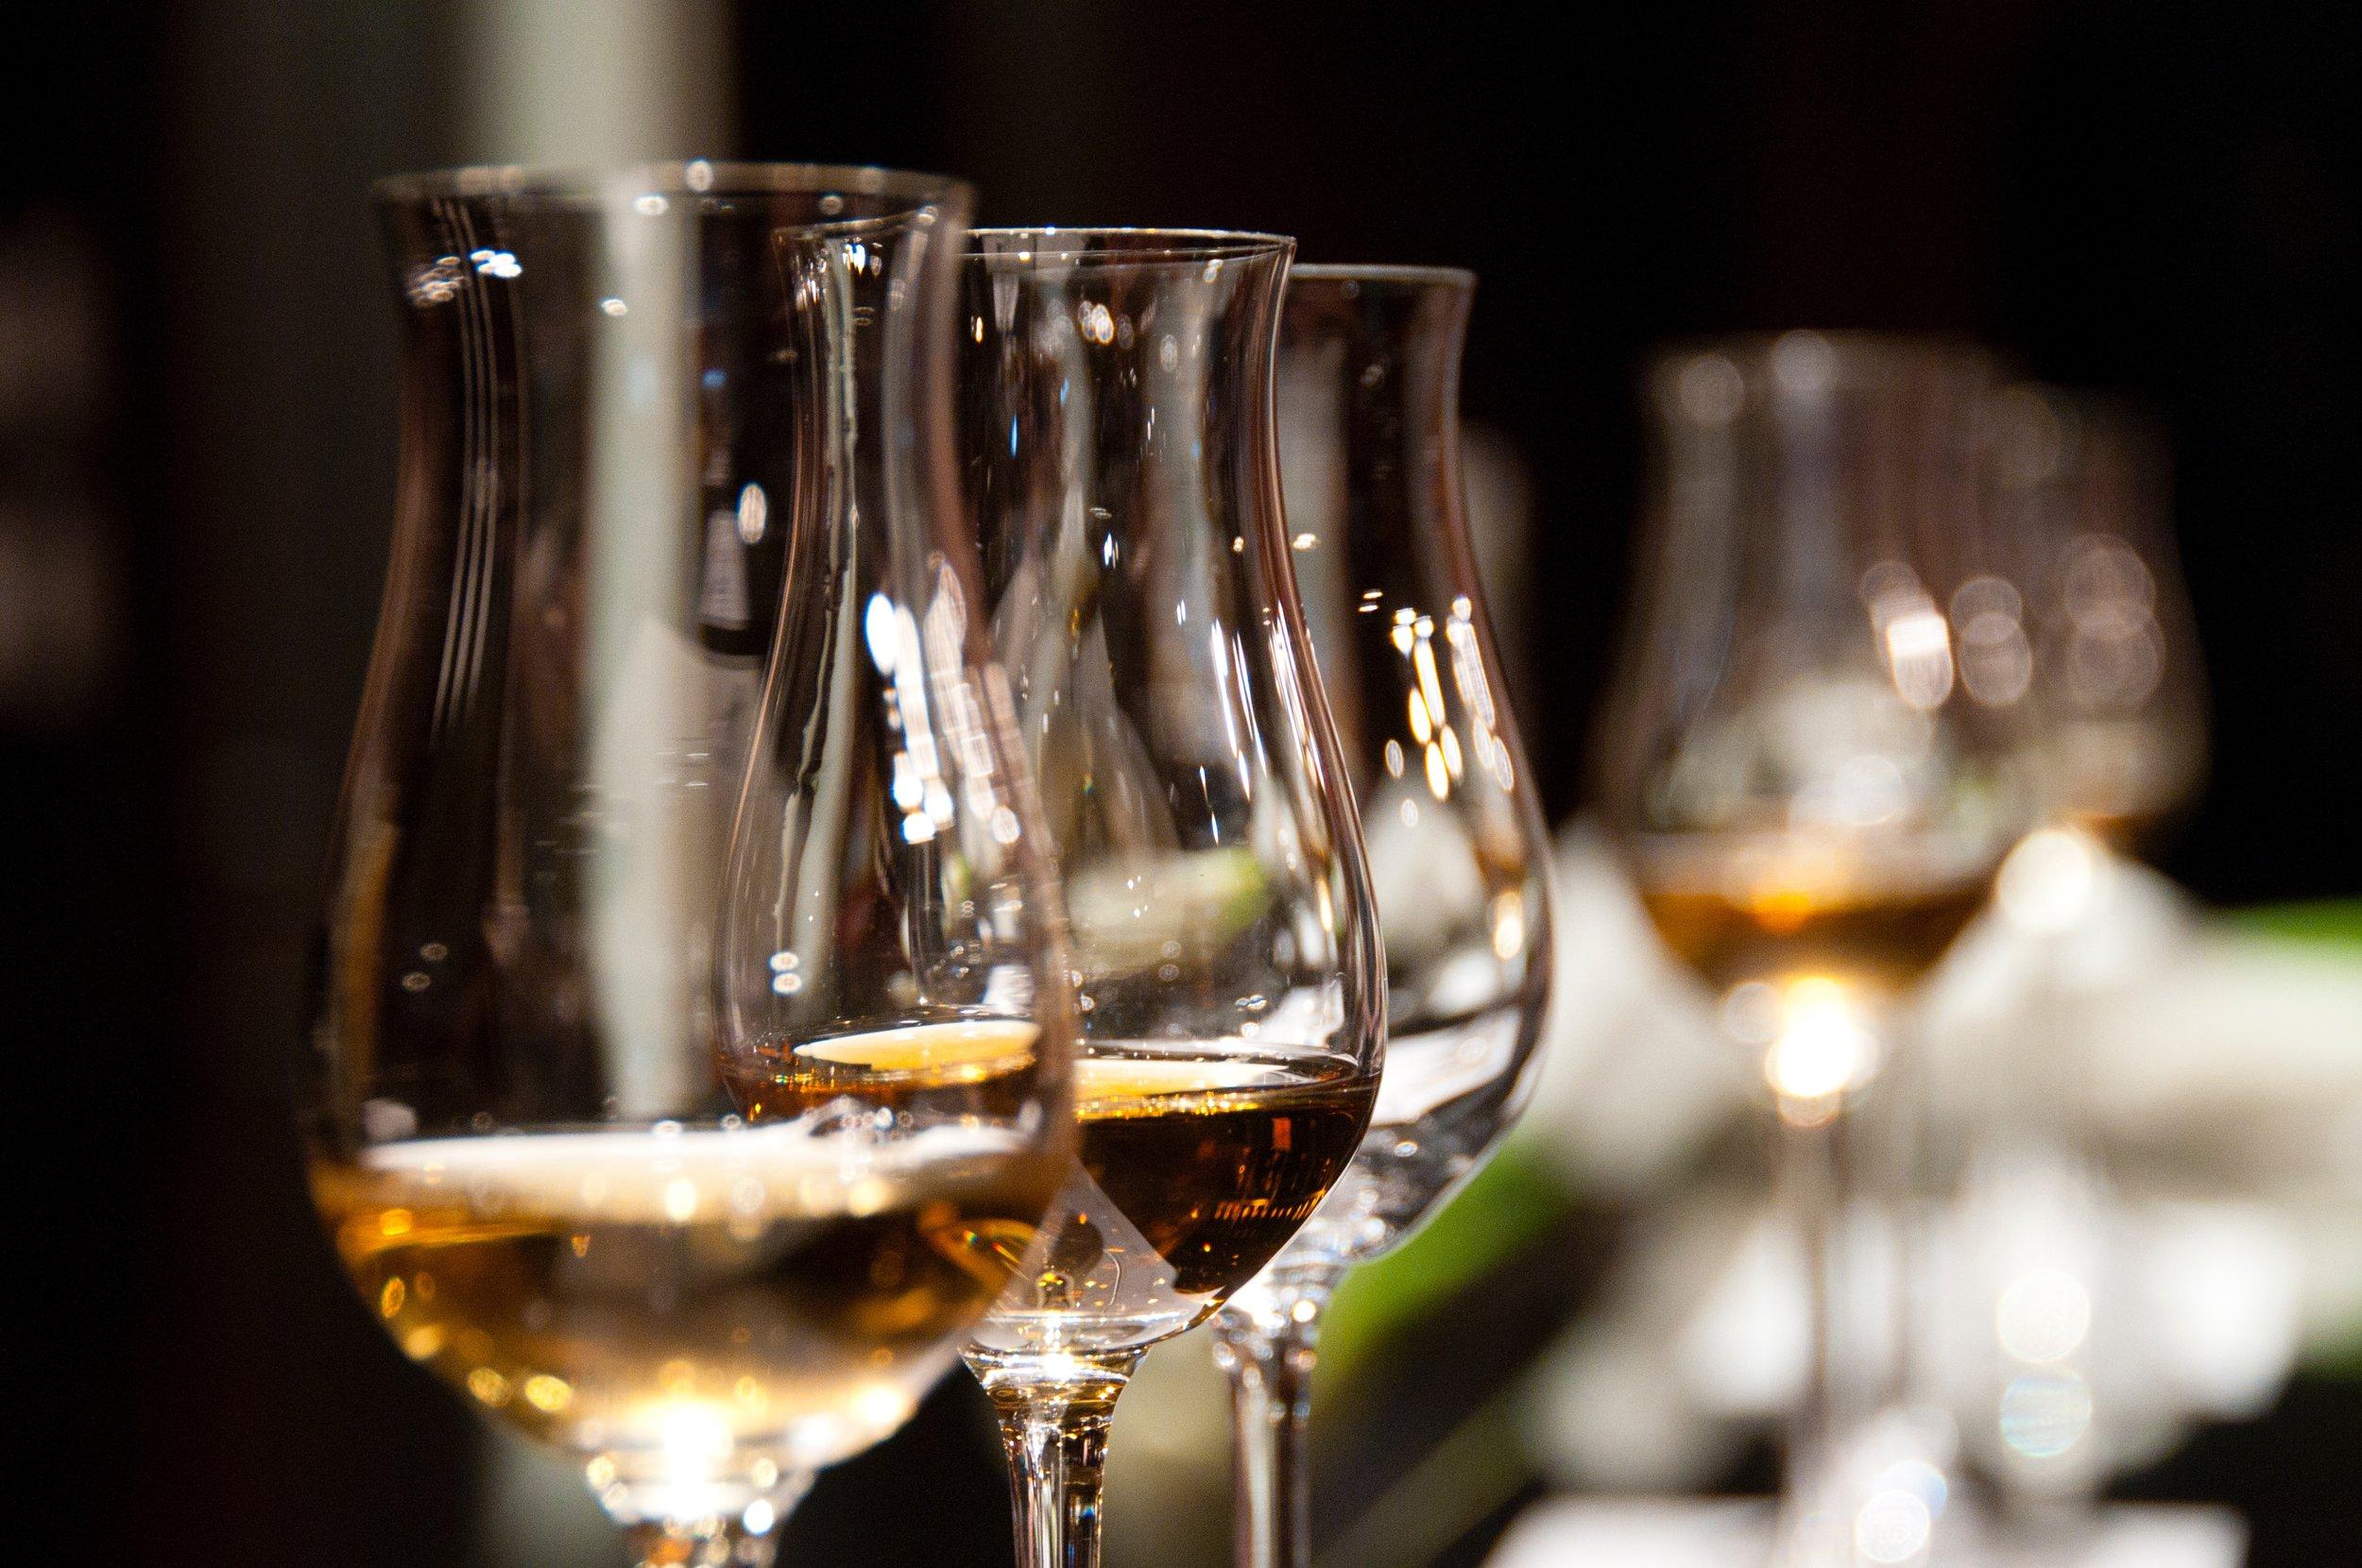 sherry-wine-glasses-spokane-bar.jpg